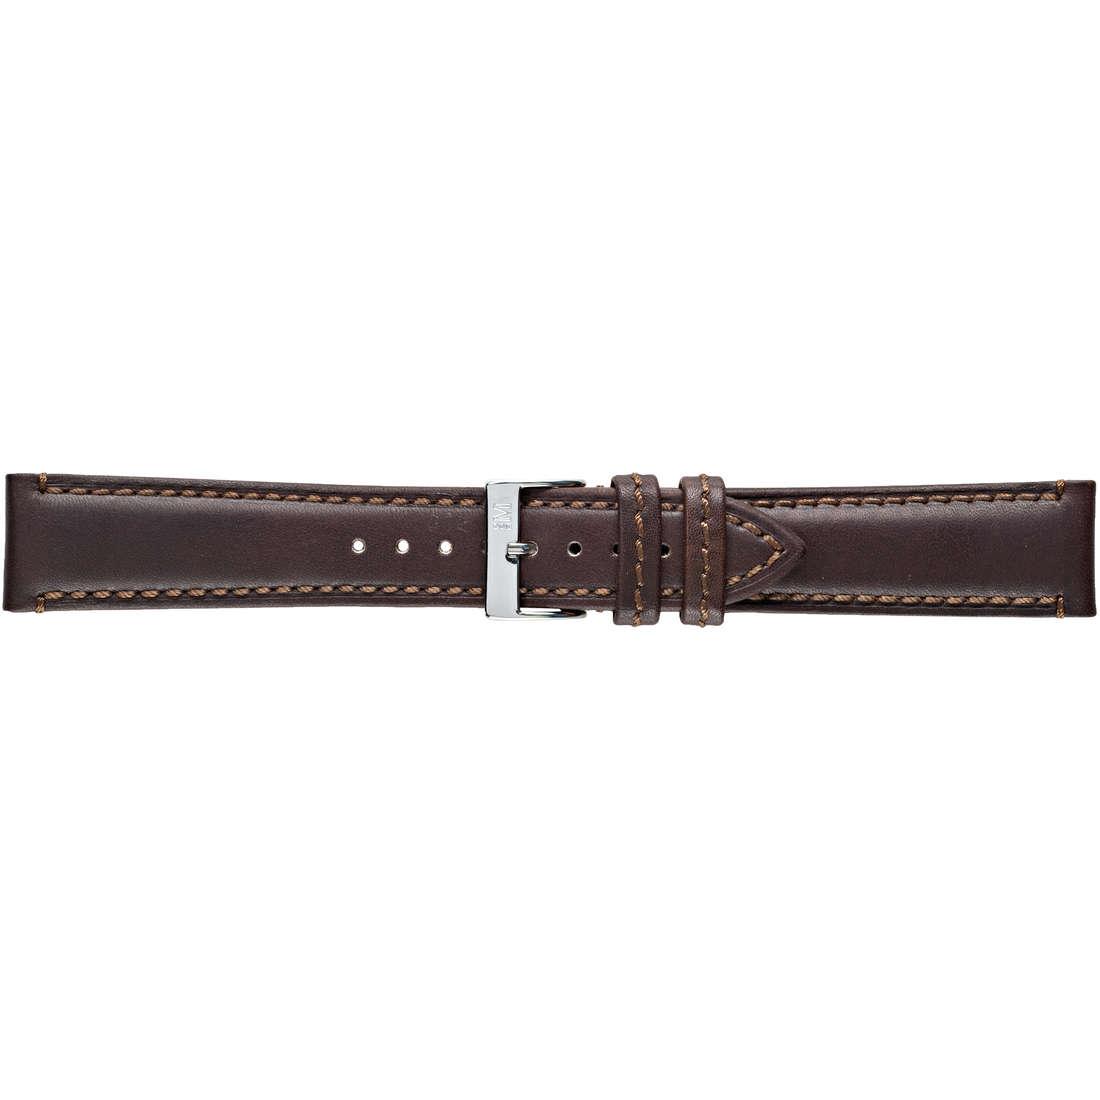 watch watch bands watch straps man Morellato Manufatti A01U3628A17032CR18